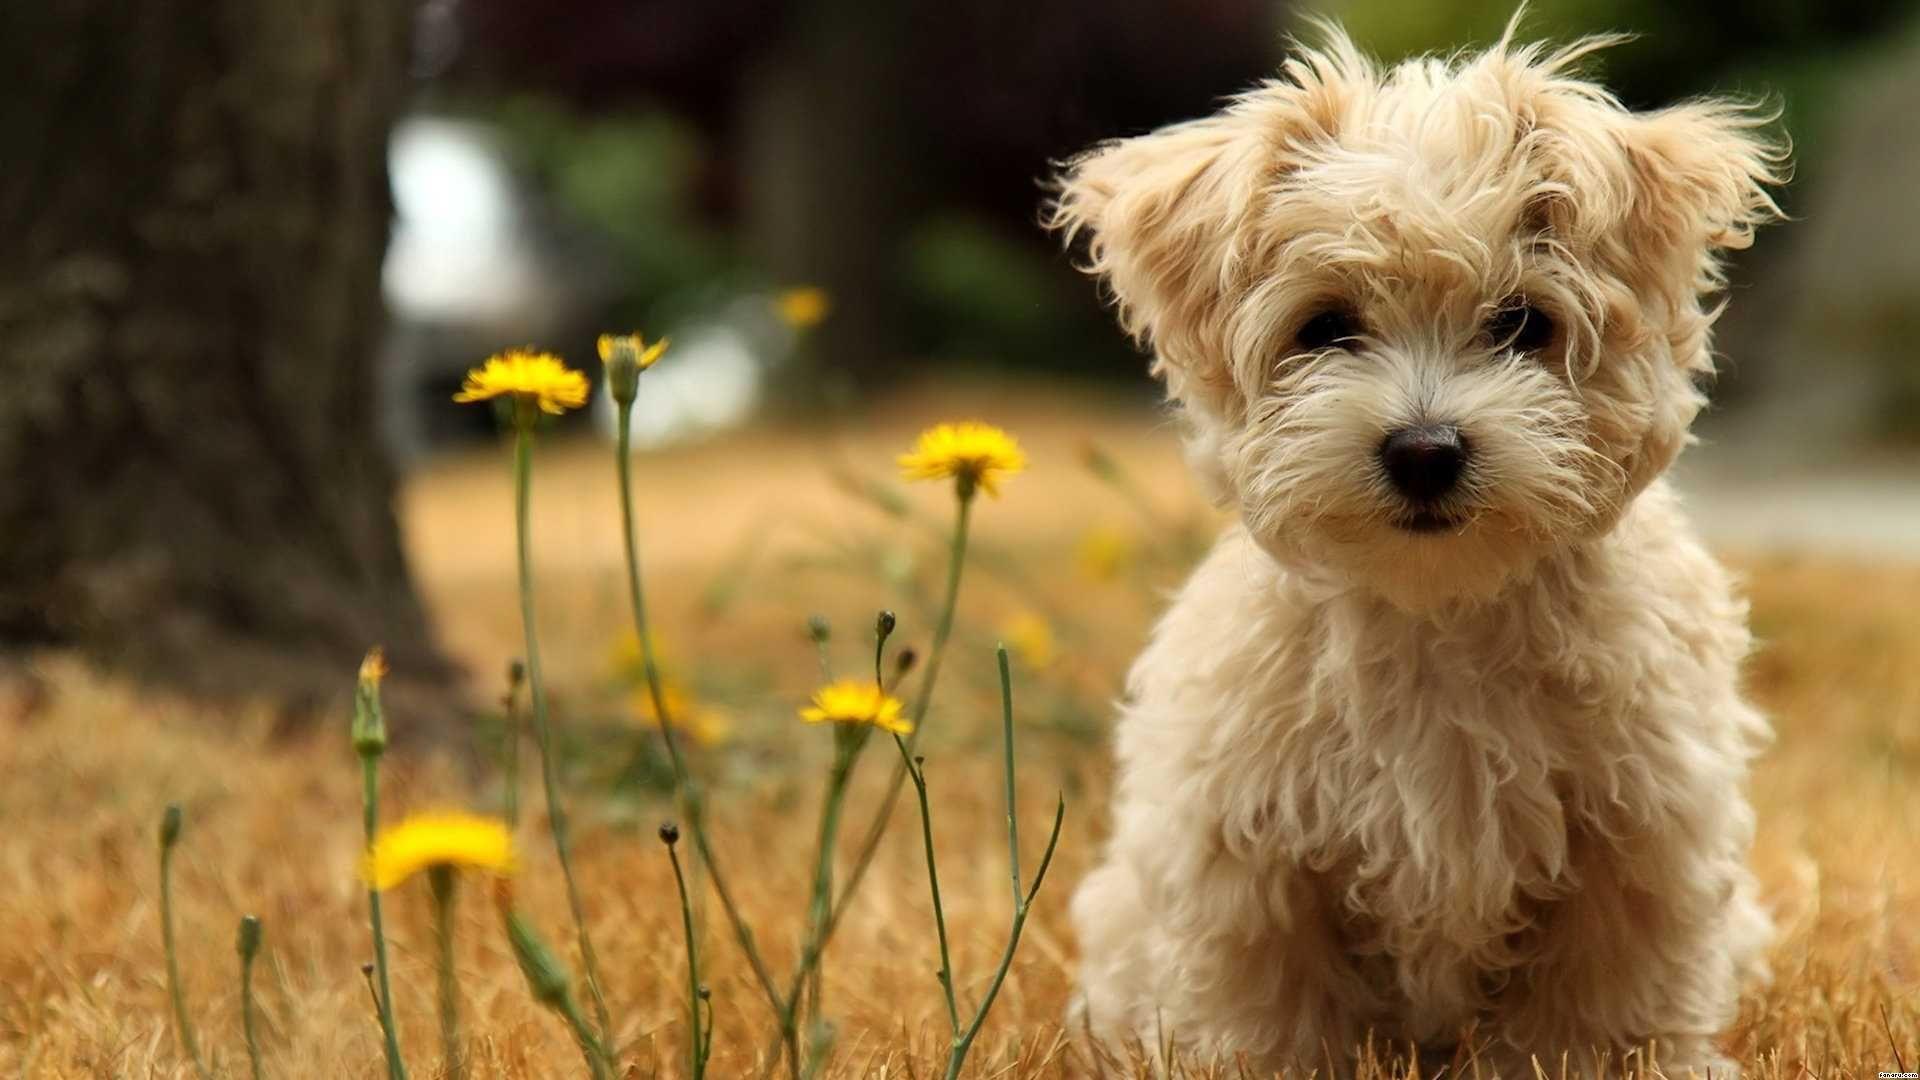 Shihtzu Dog Wallpapers Animal Wallpapers Pinterest Teddy